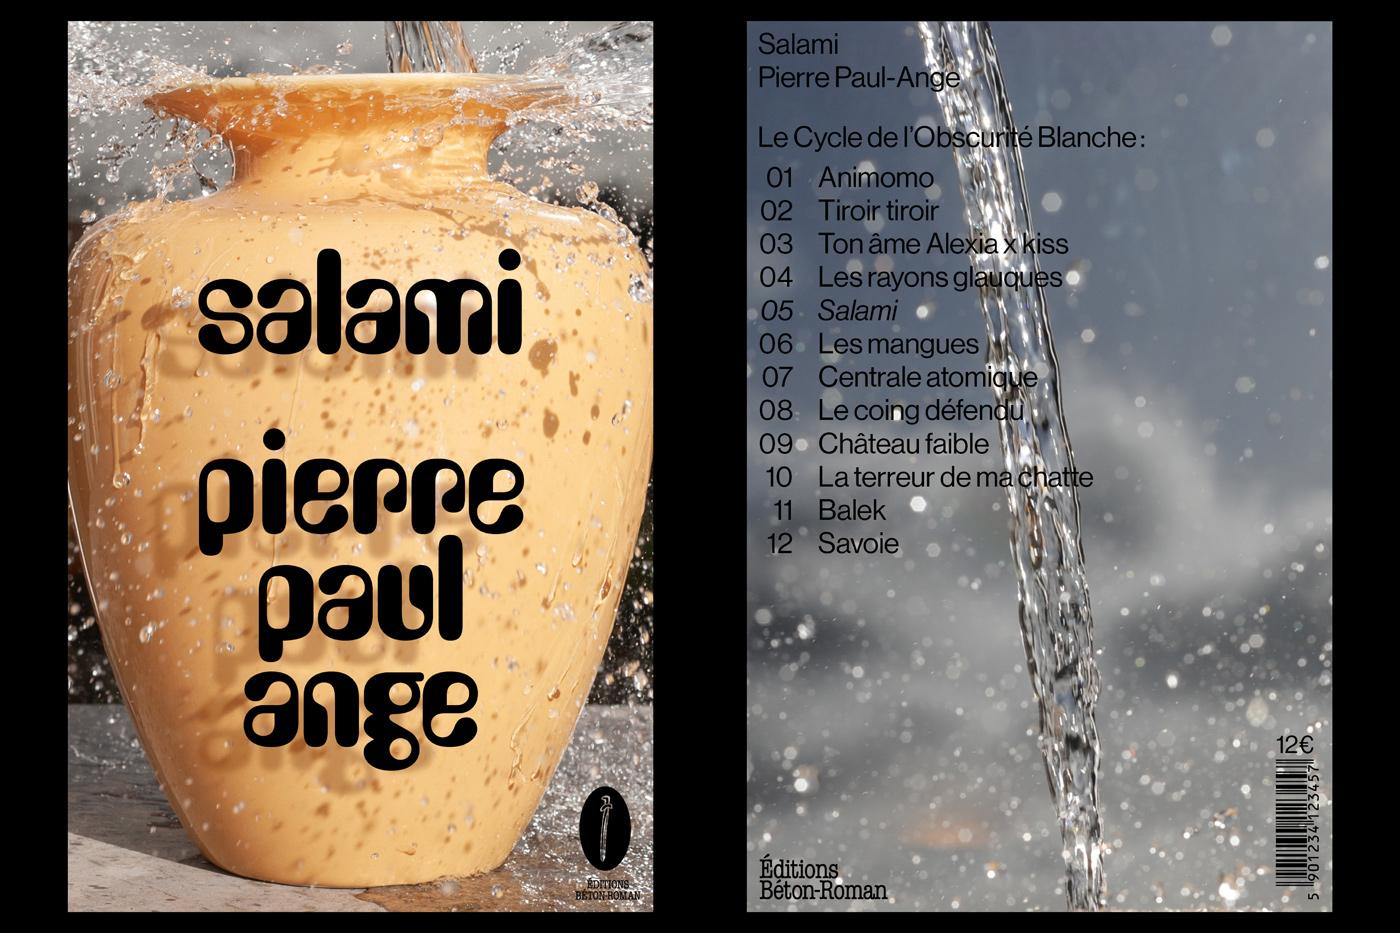 04 collide24 Europium - Europium's collaborative practice explores the relationship between photography and graphic design